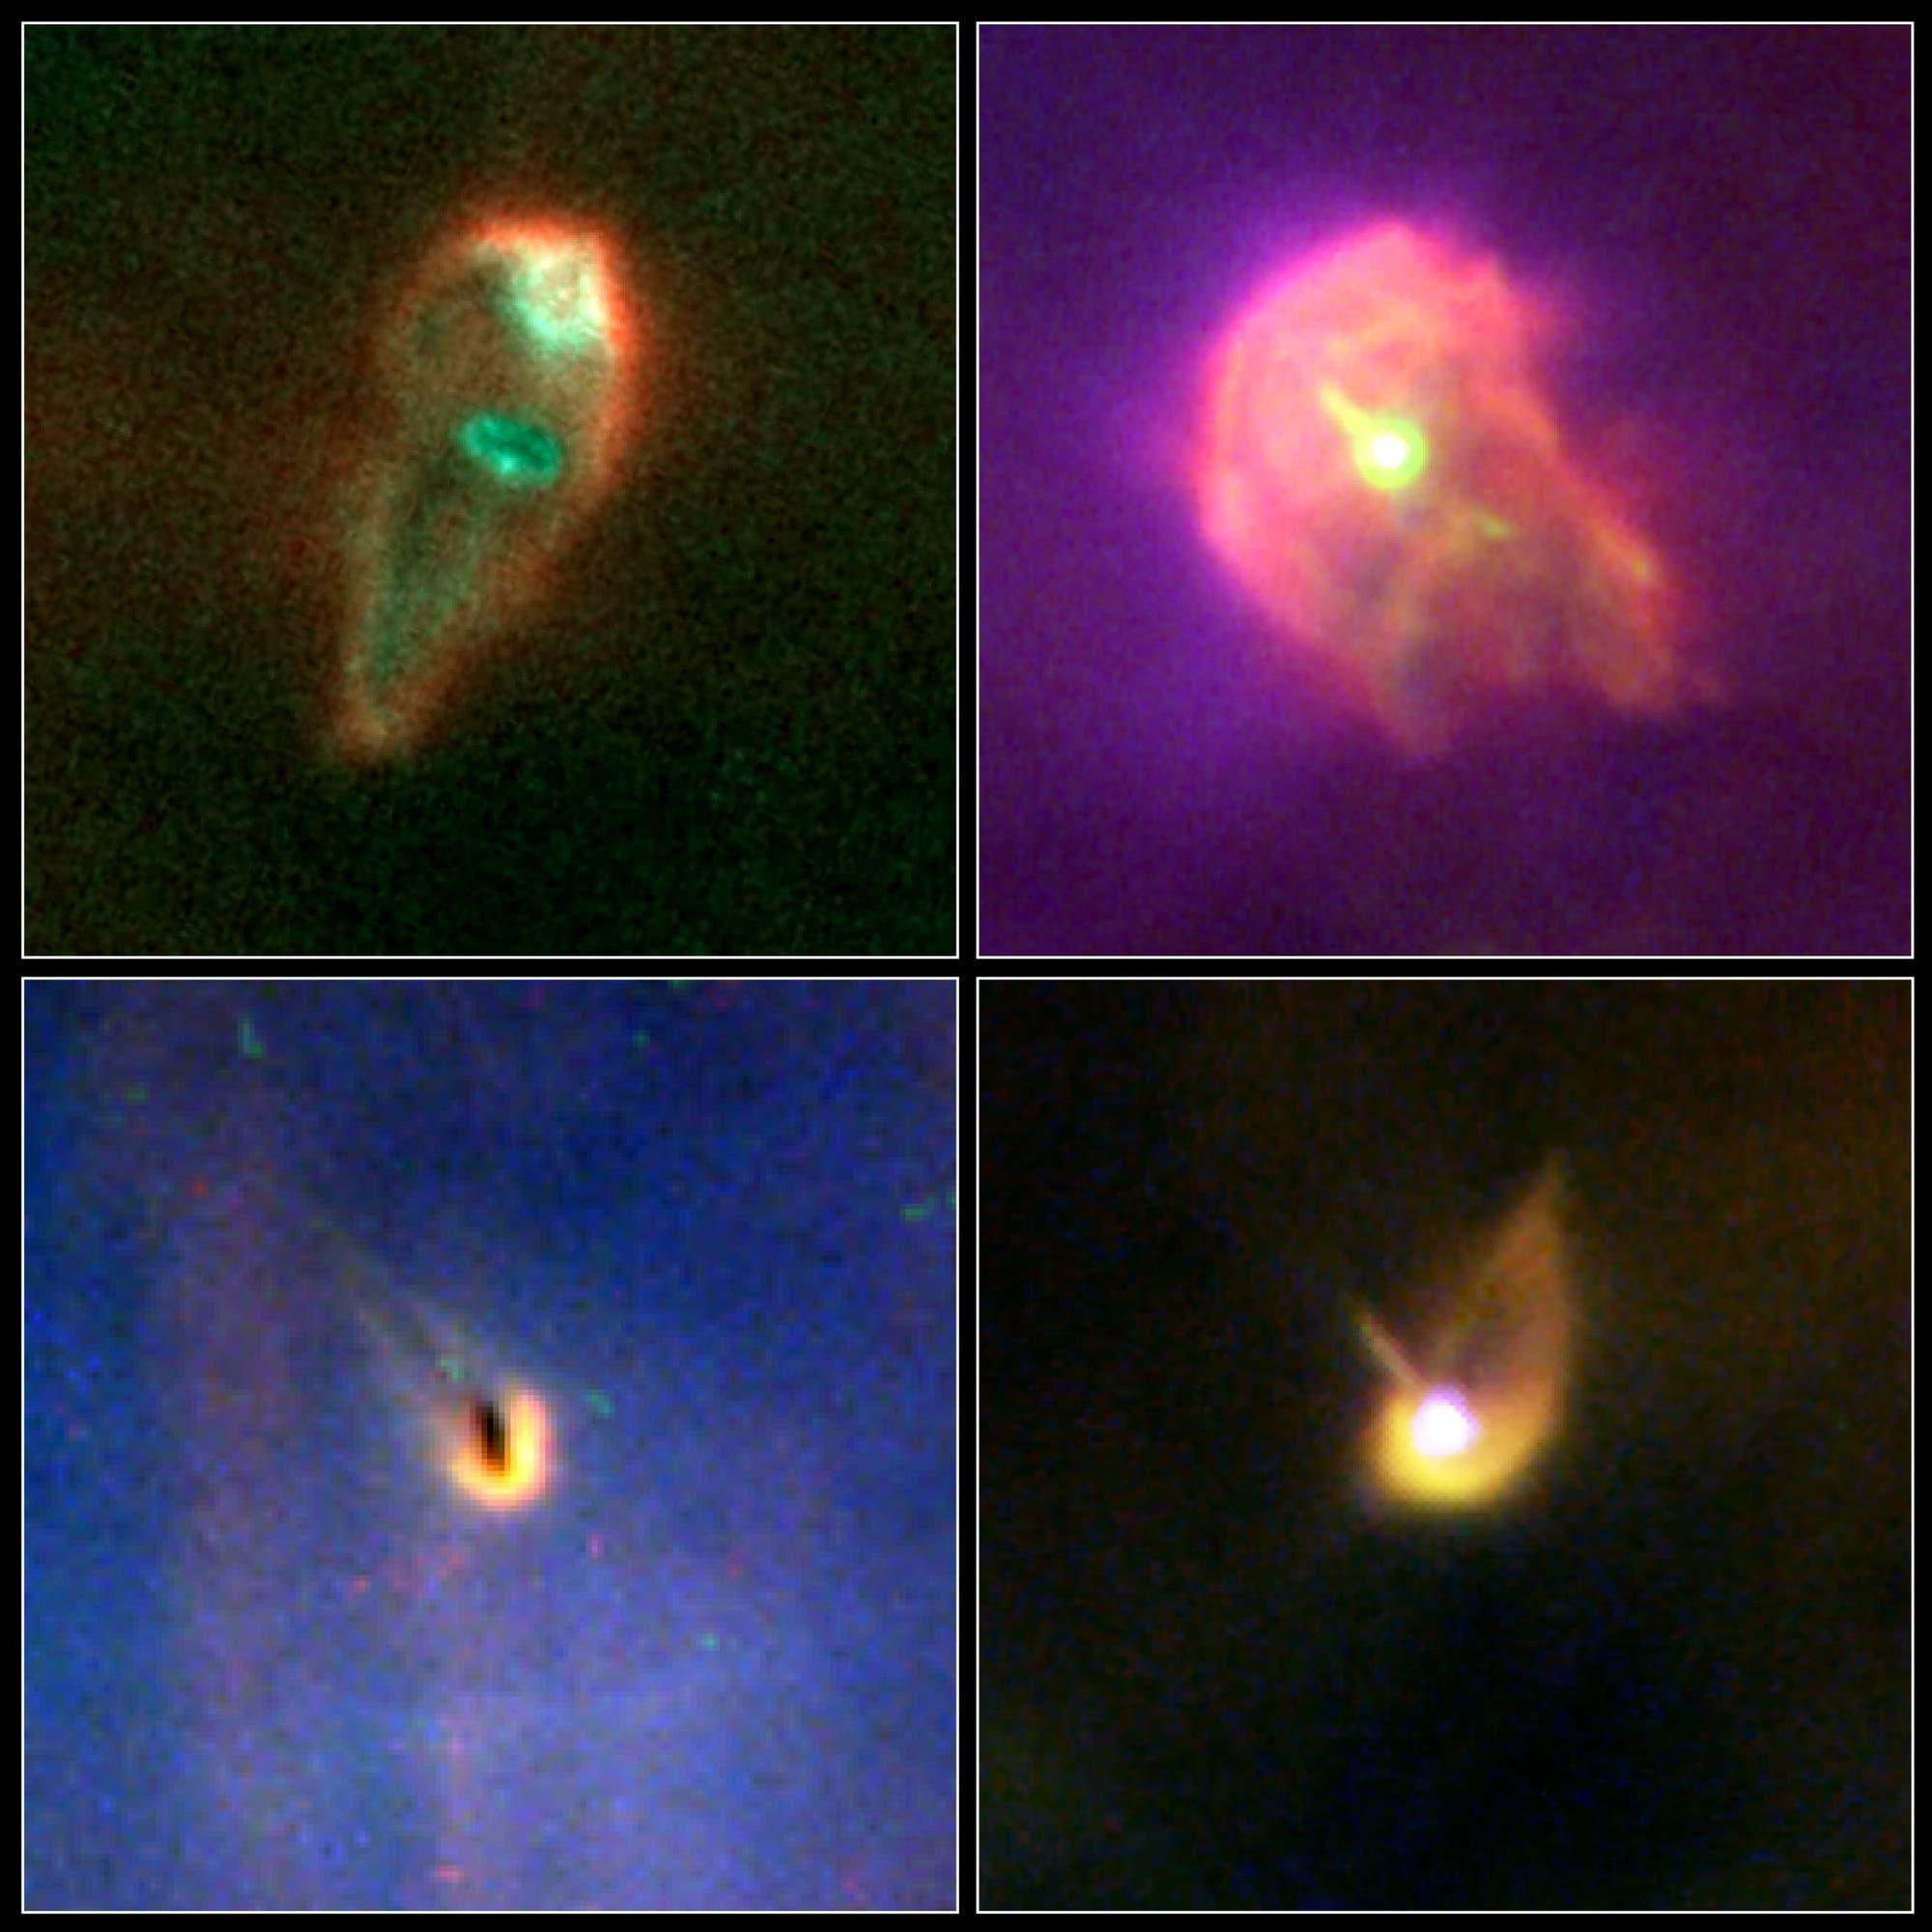 Proplyden im Orionnebel (Aufnahmen des Weltraumteleskops Hubble)